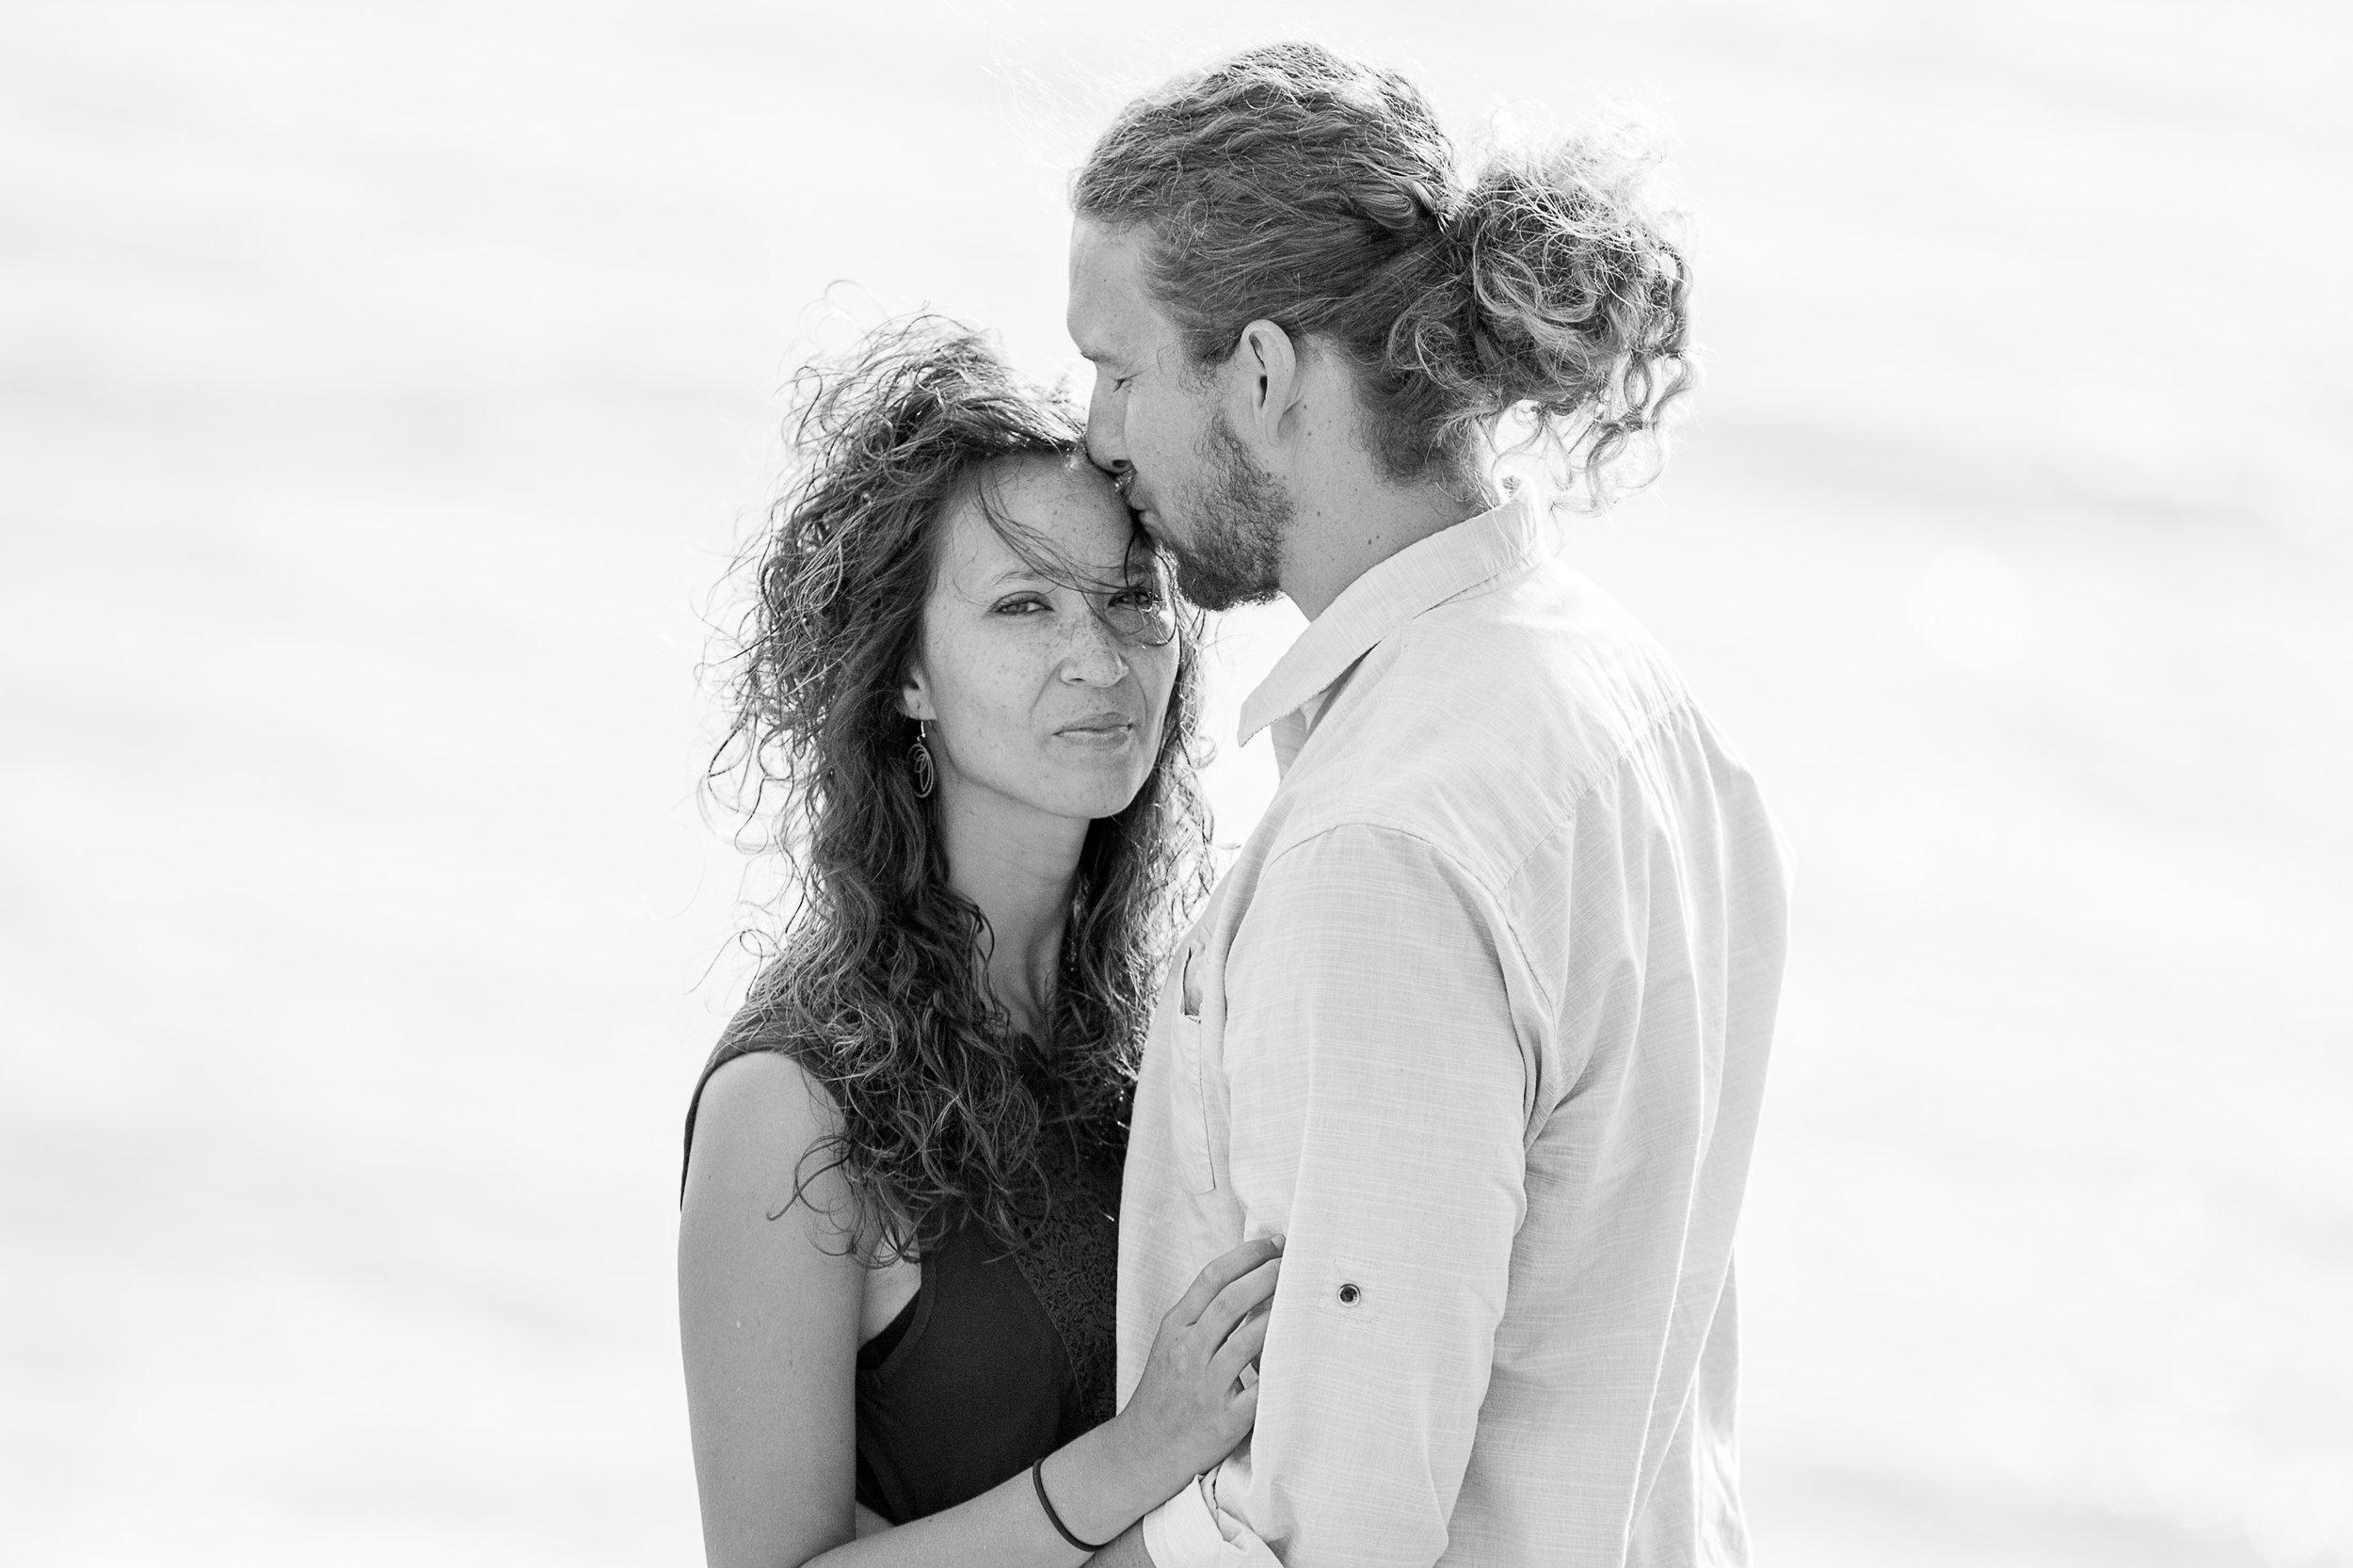 la-jolla-glider-point-torrey-pines-anniversary-session-true-loves-kiss-san-diego-photographer-sophia-elizabeth (35 of 181).jpg